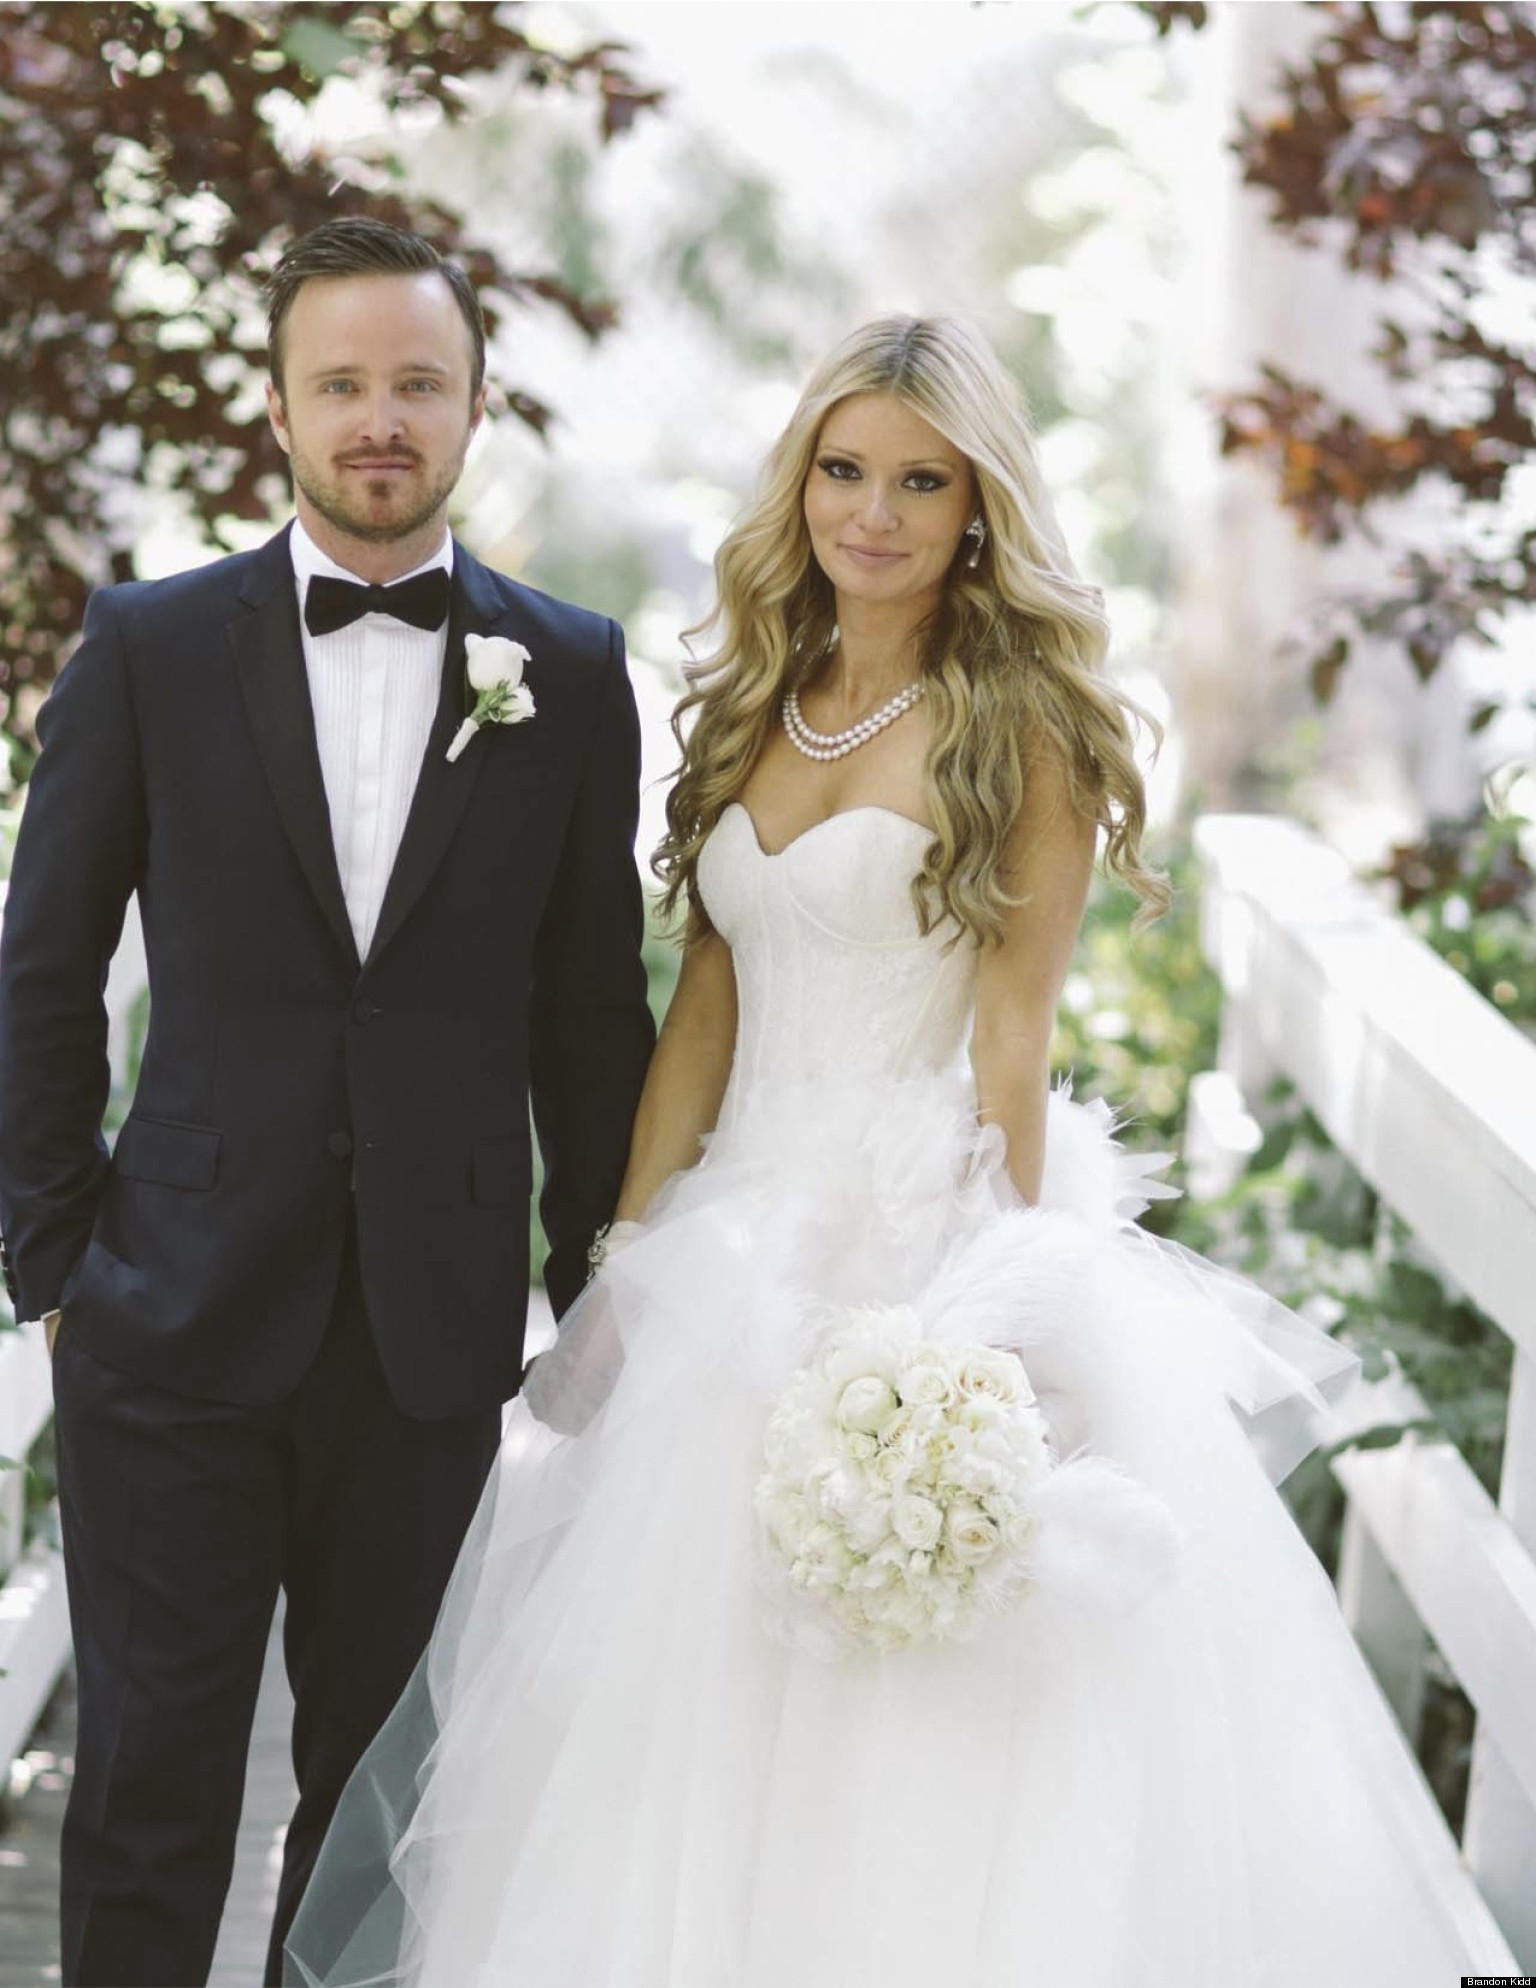 Aaron Paul S Wedding Details Revealed Photos Huffpost